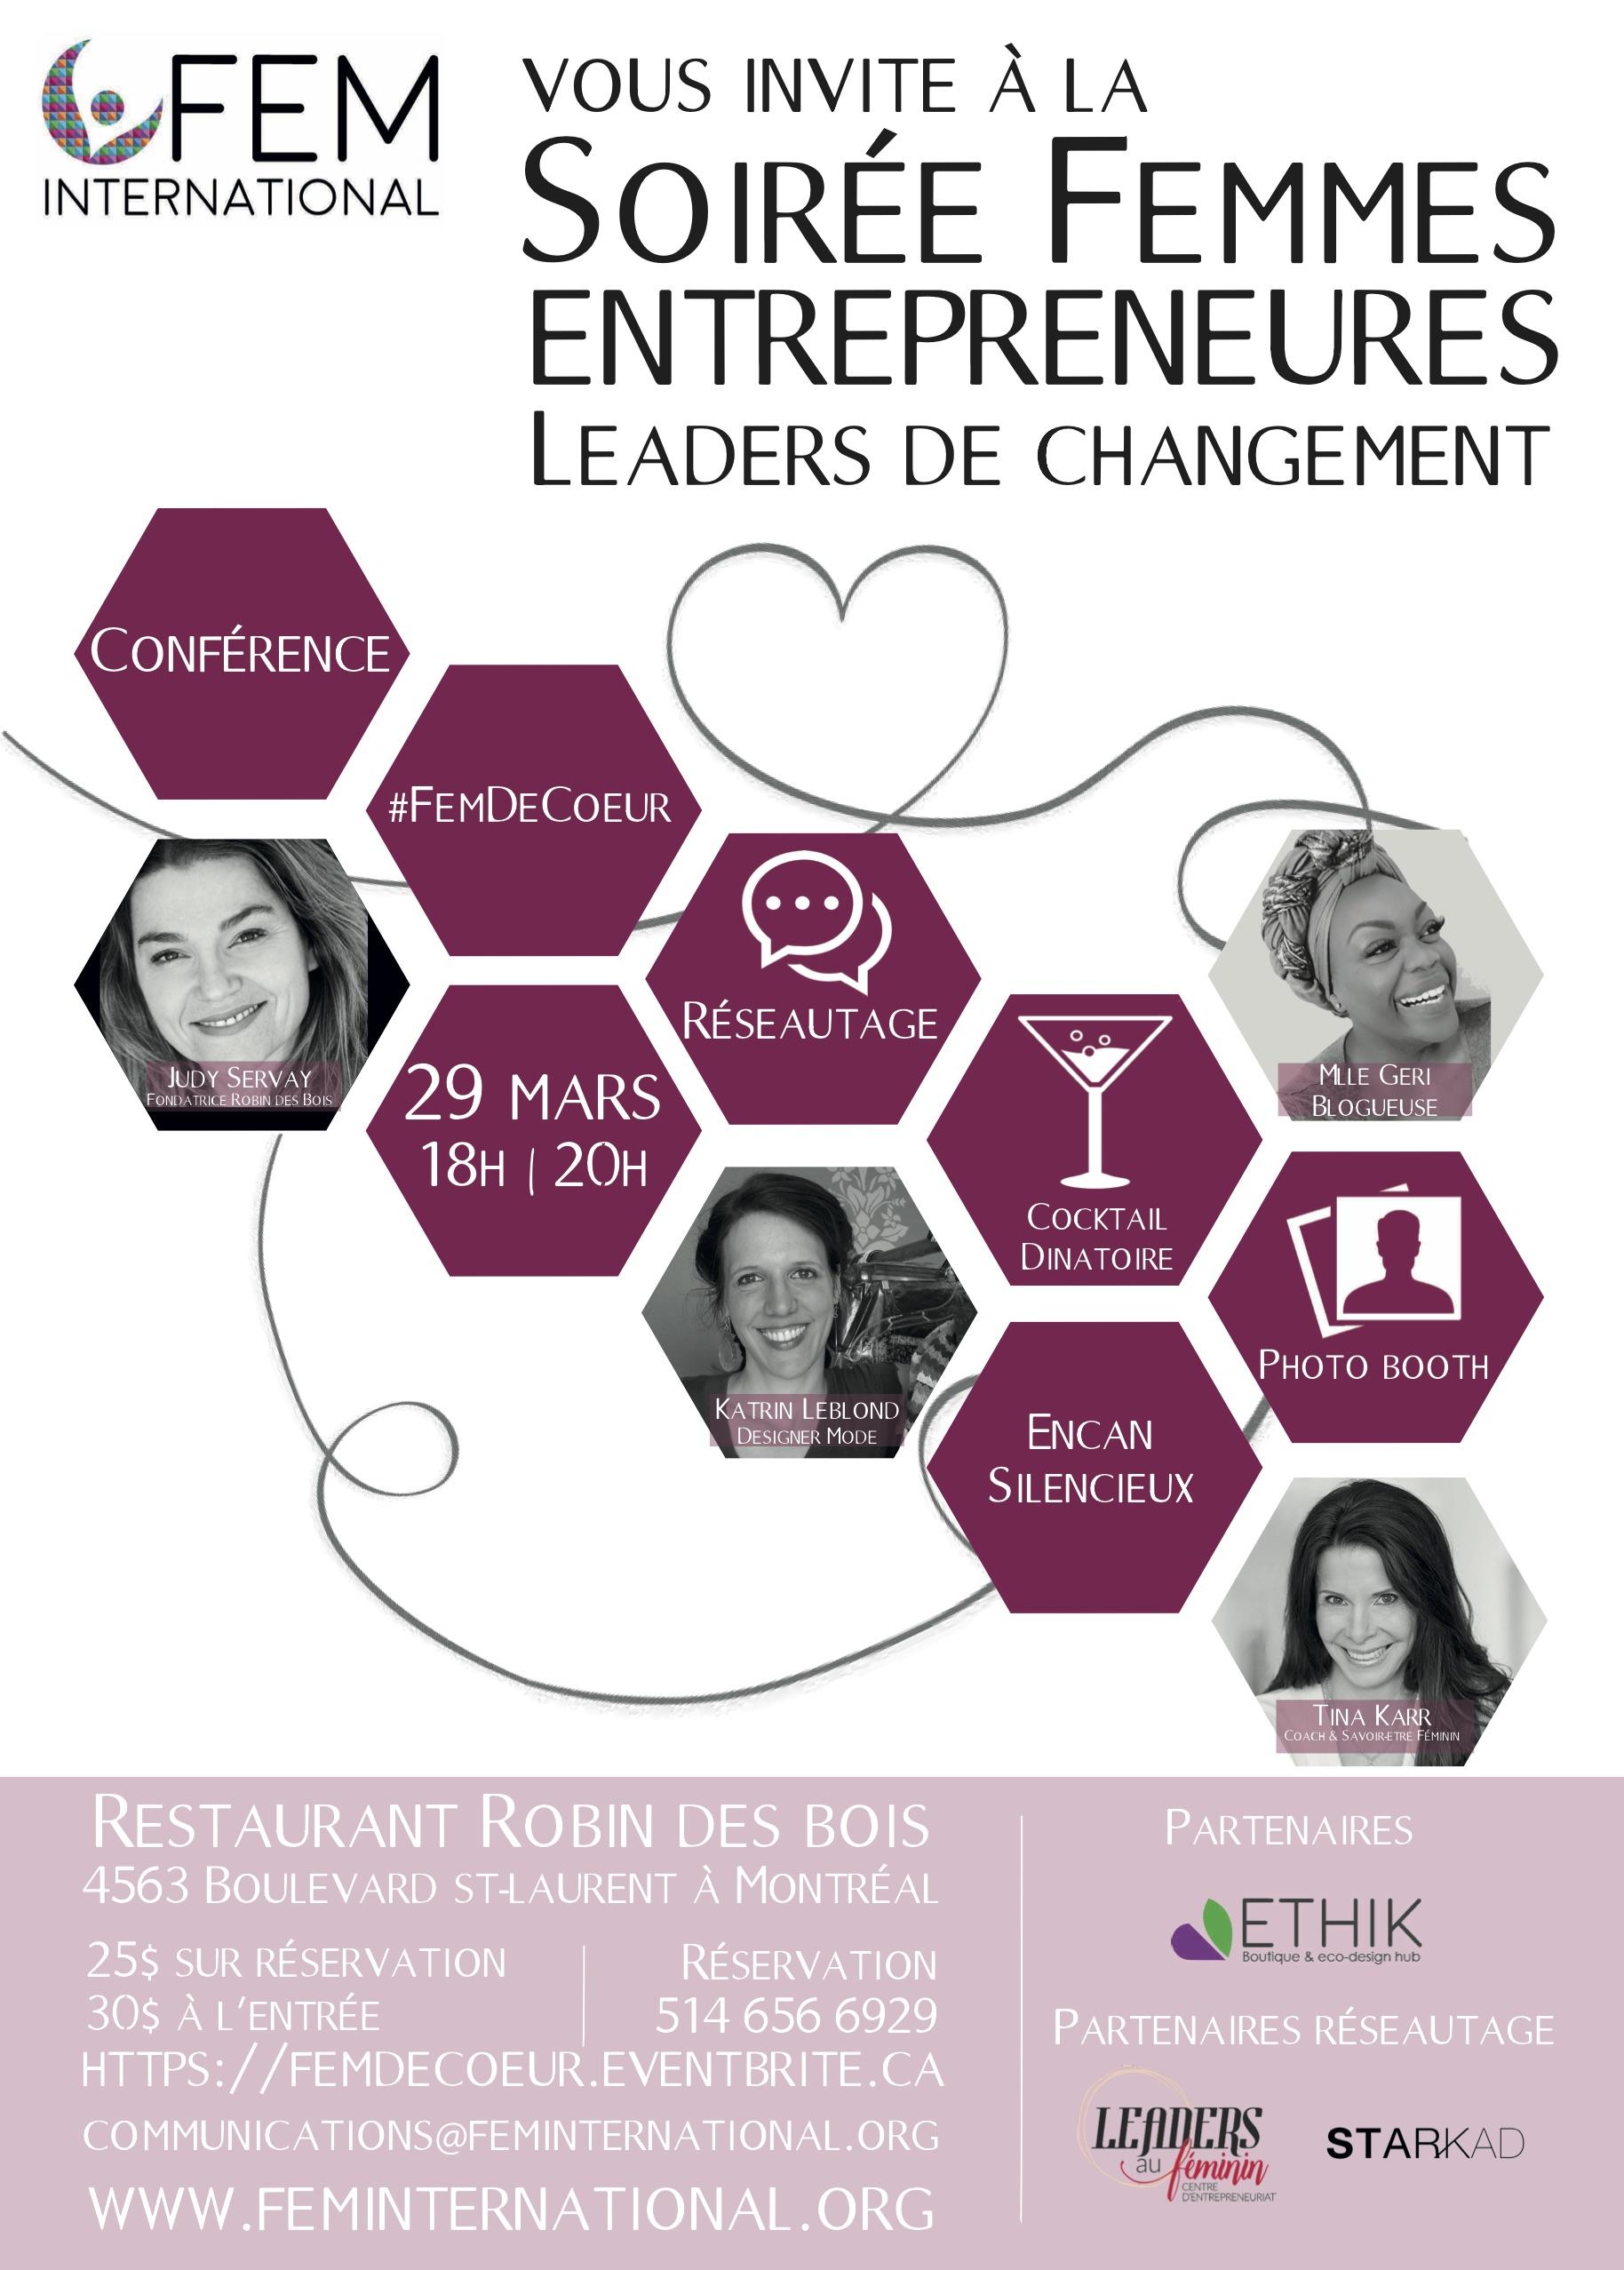 soiree-femmes-entrepreneures-leaders-de-changement-29-mars-2017